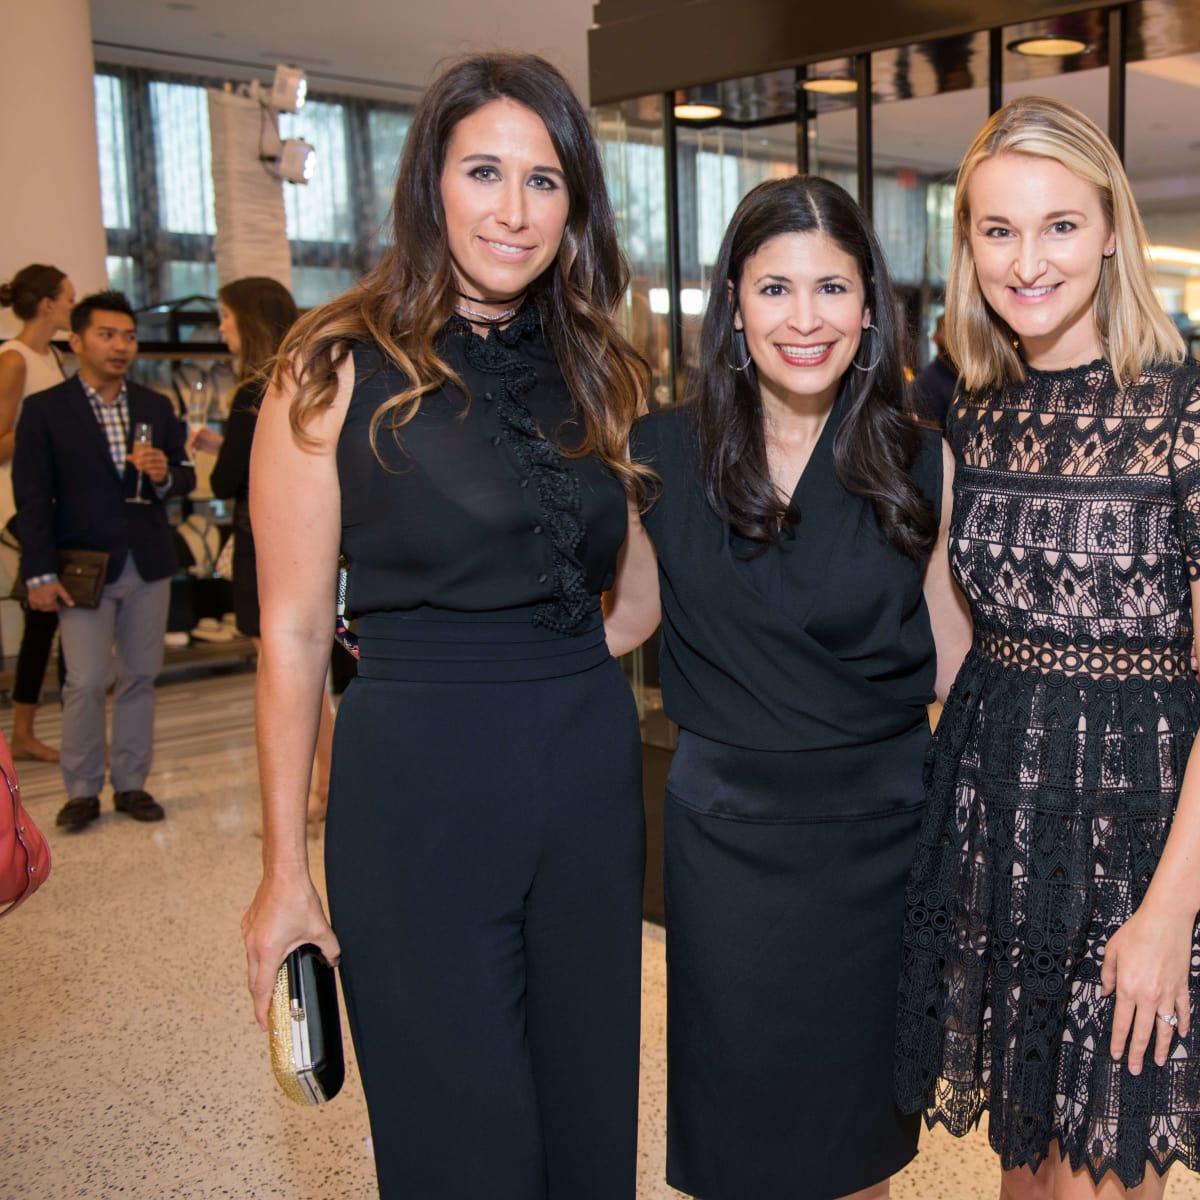 Fresh Faces of Fashion 8/16, Rachel Solar, Kristy Bradshaw, Jennifer Cope